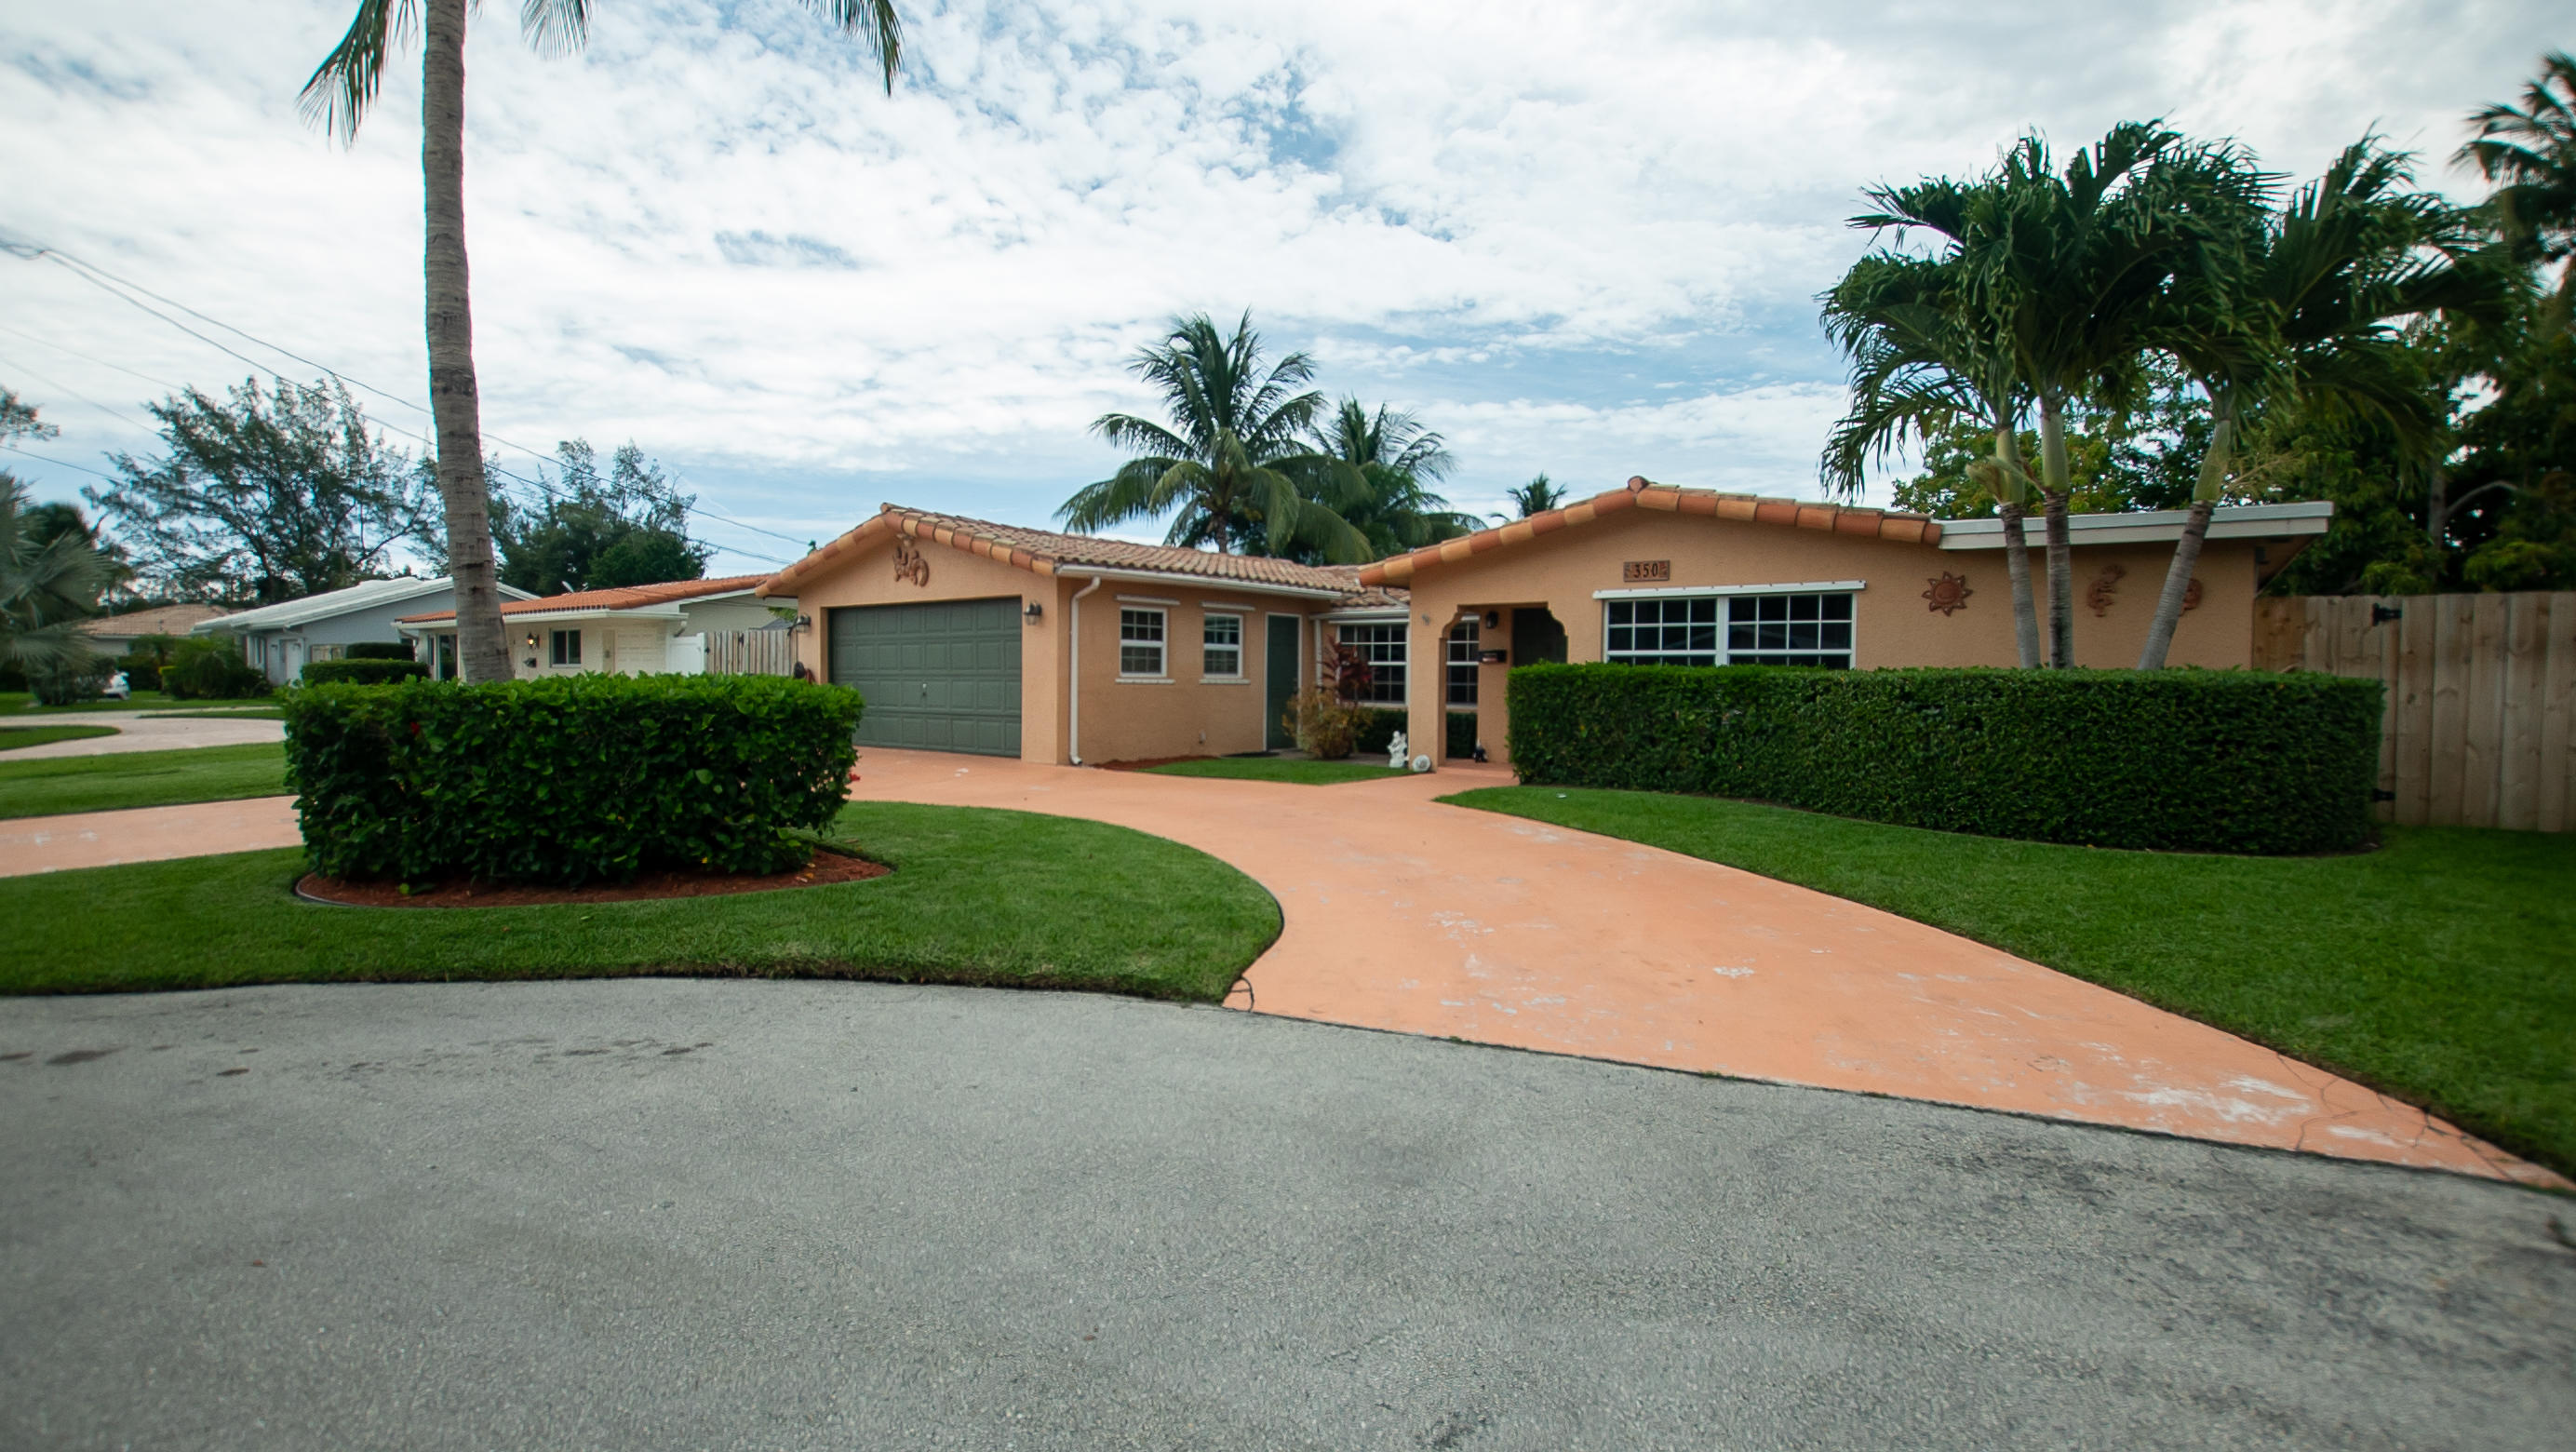 Photo of 350 SW 14th Place, Boca Raton, FL 33432